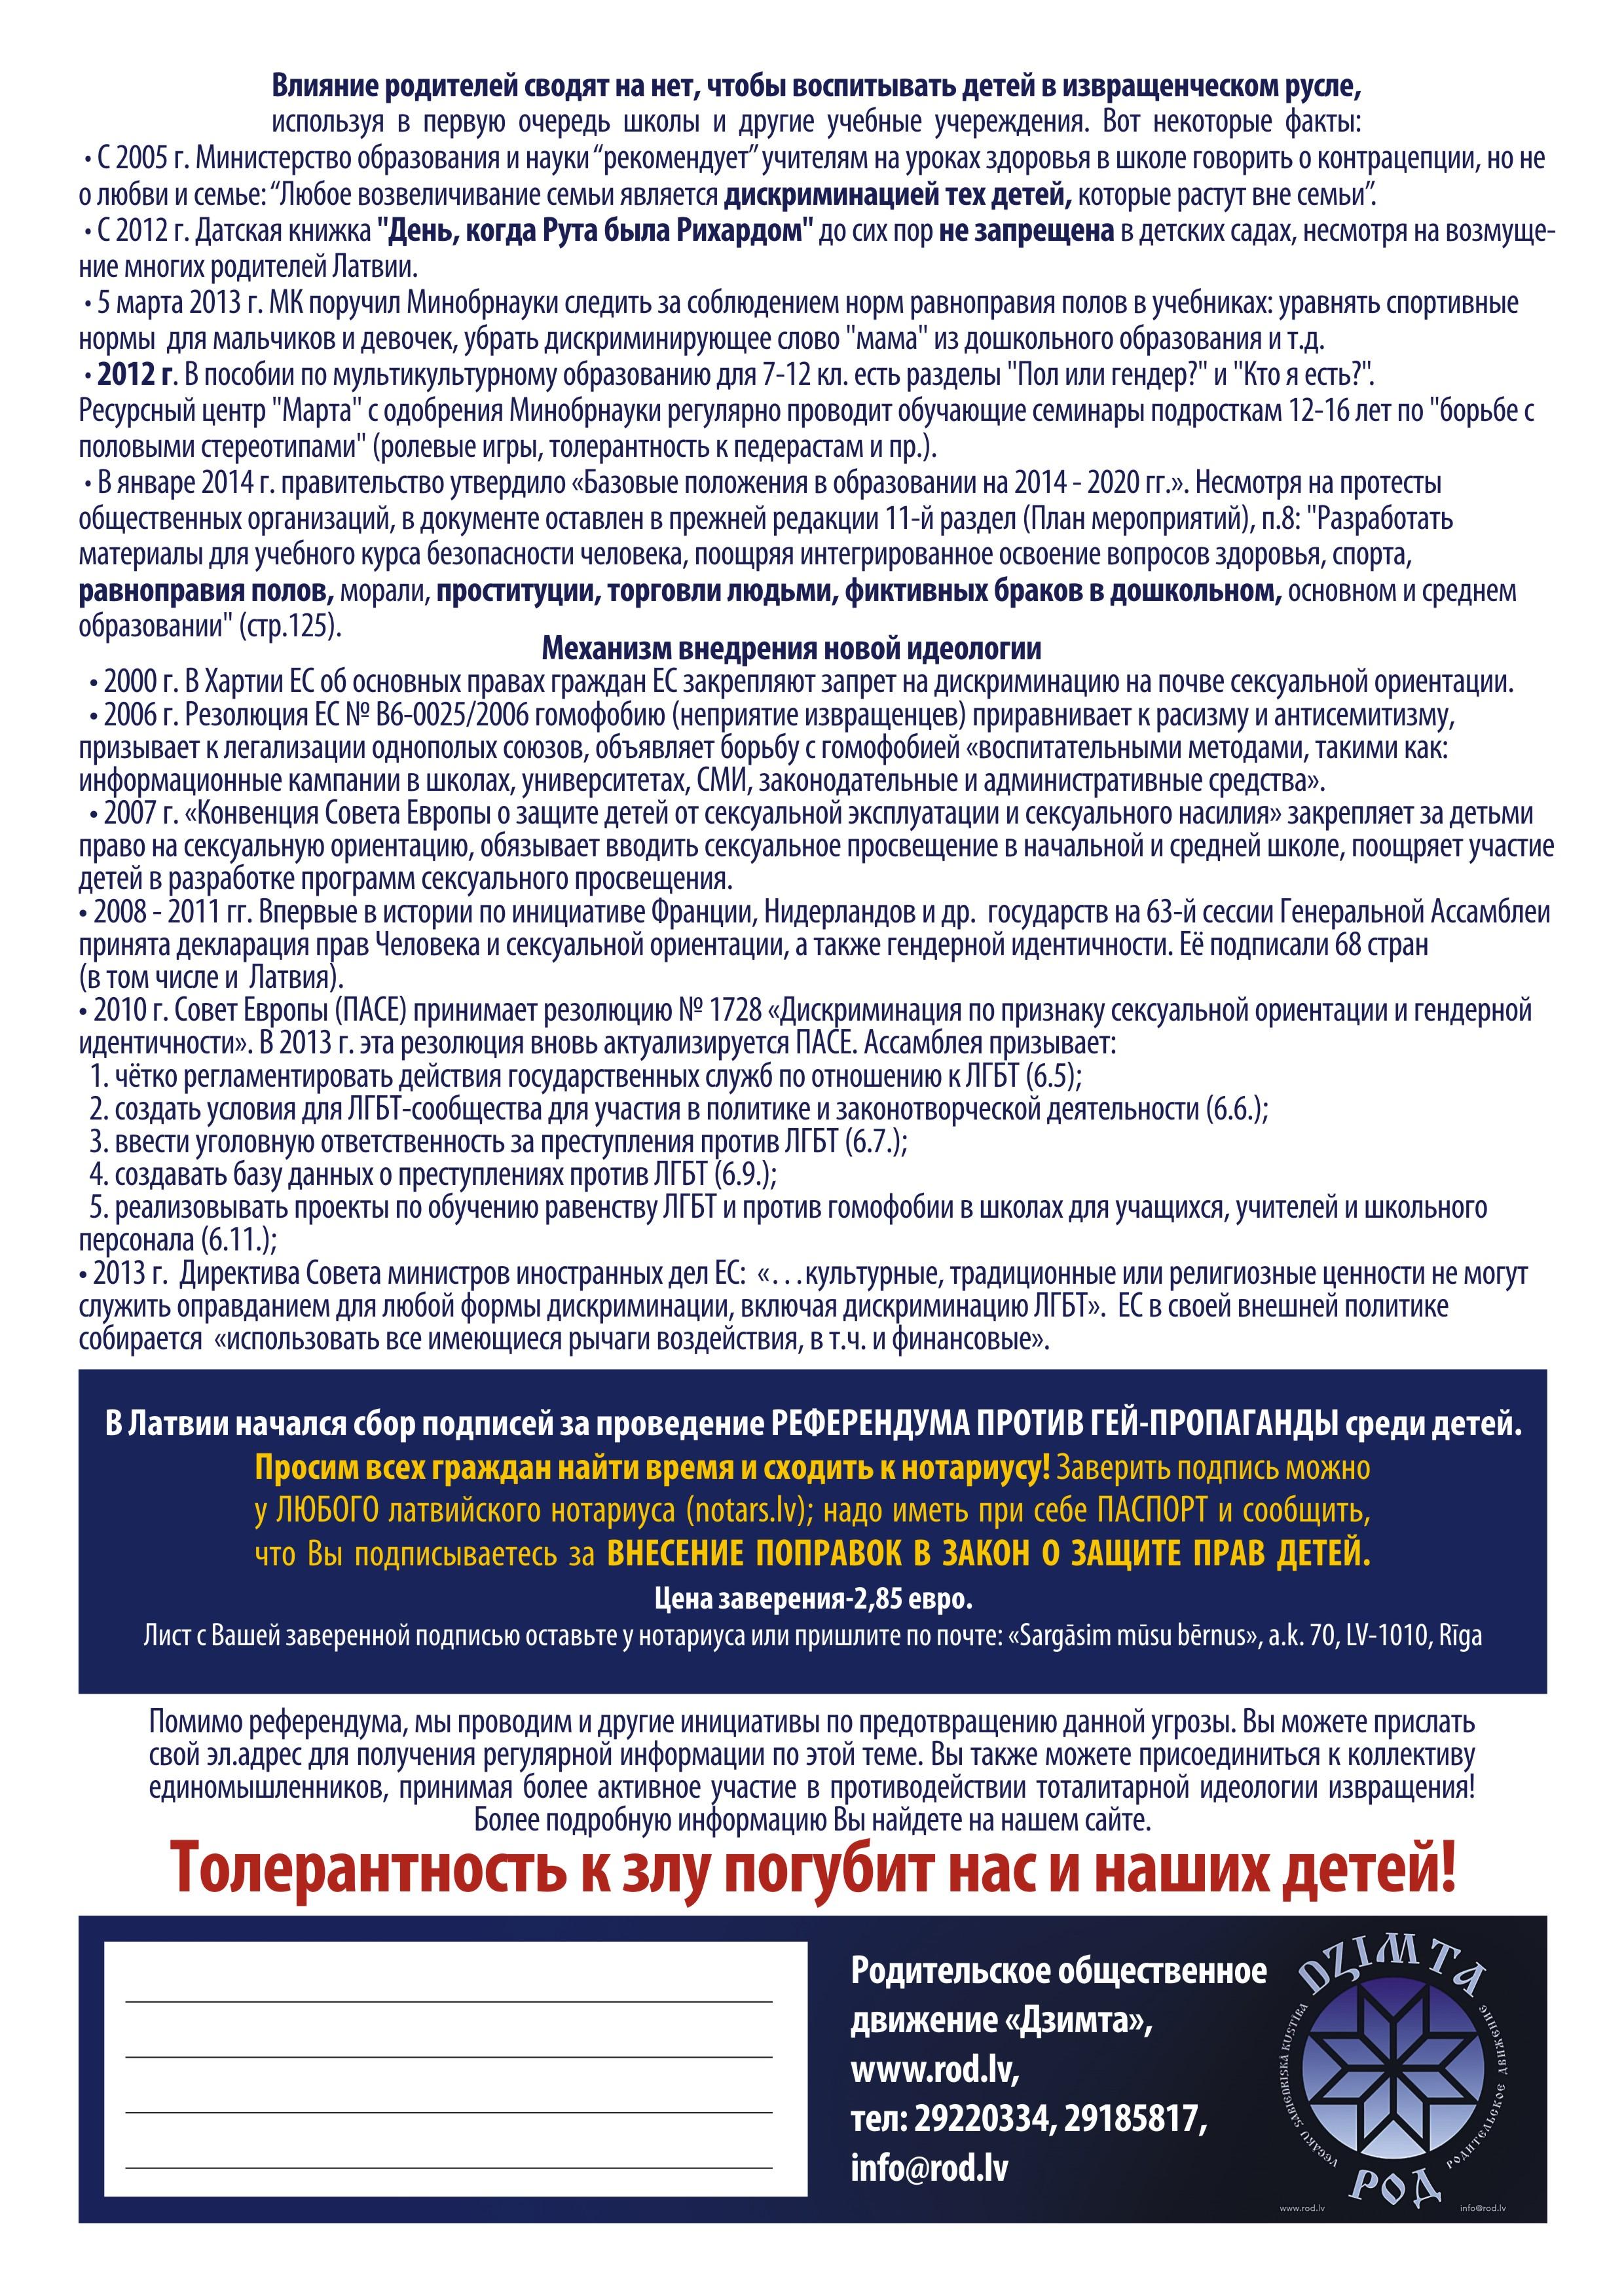 http://rod.lv/files/agitation/euro-sodom2.jpg